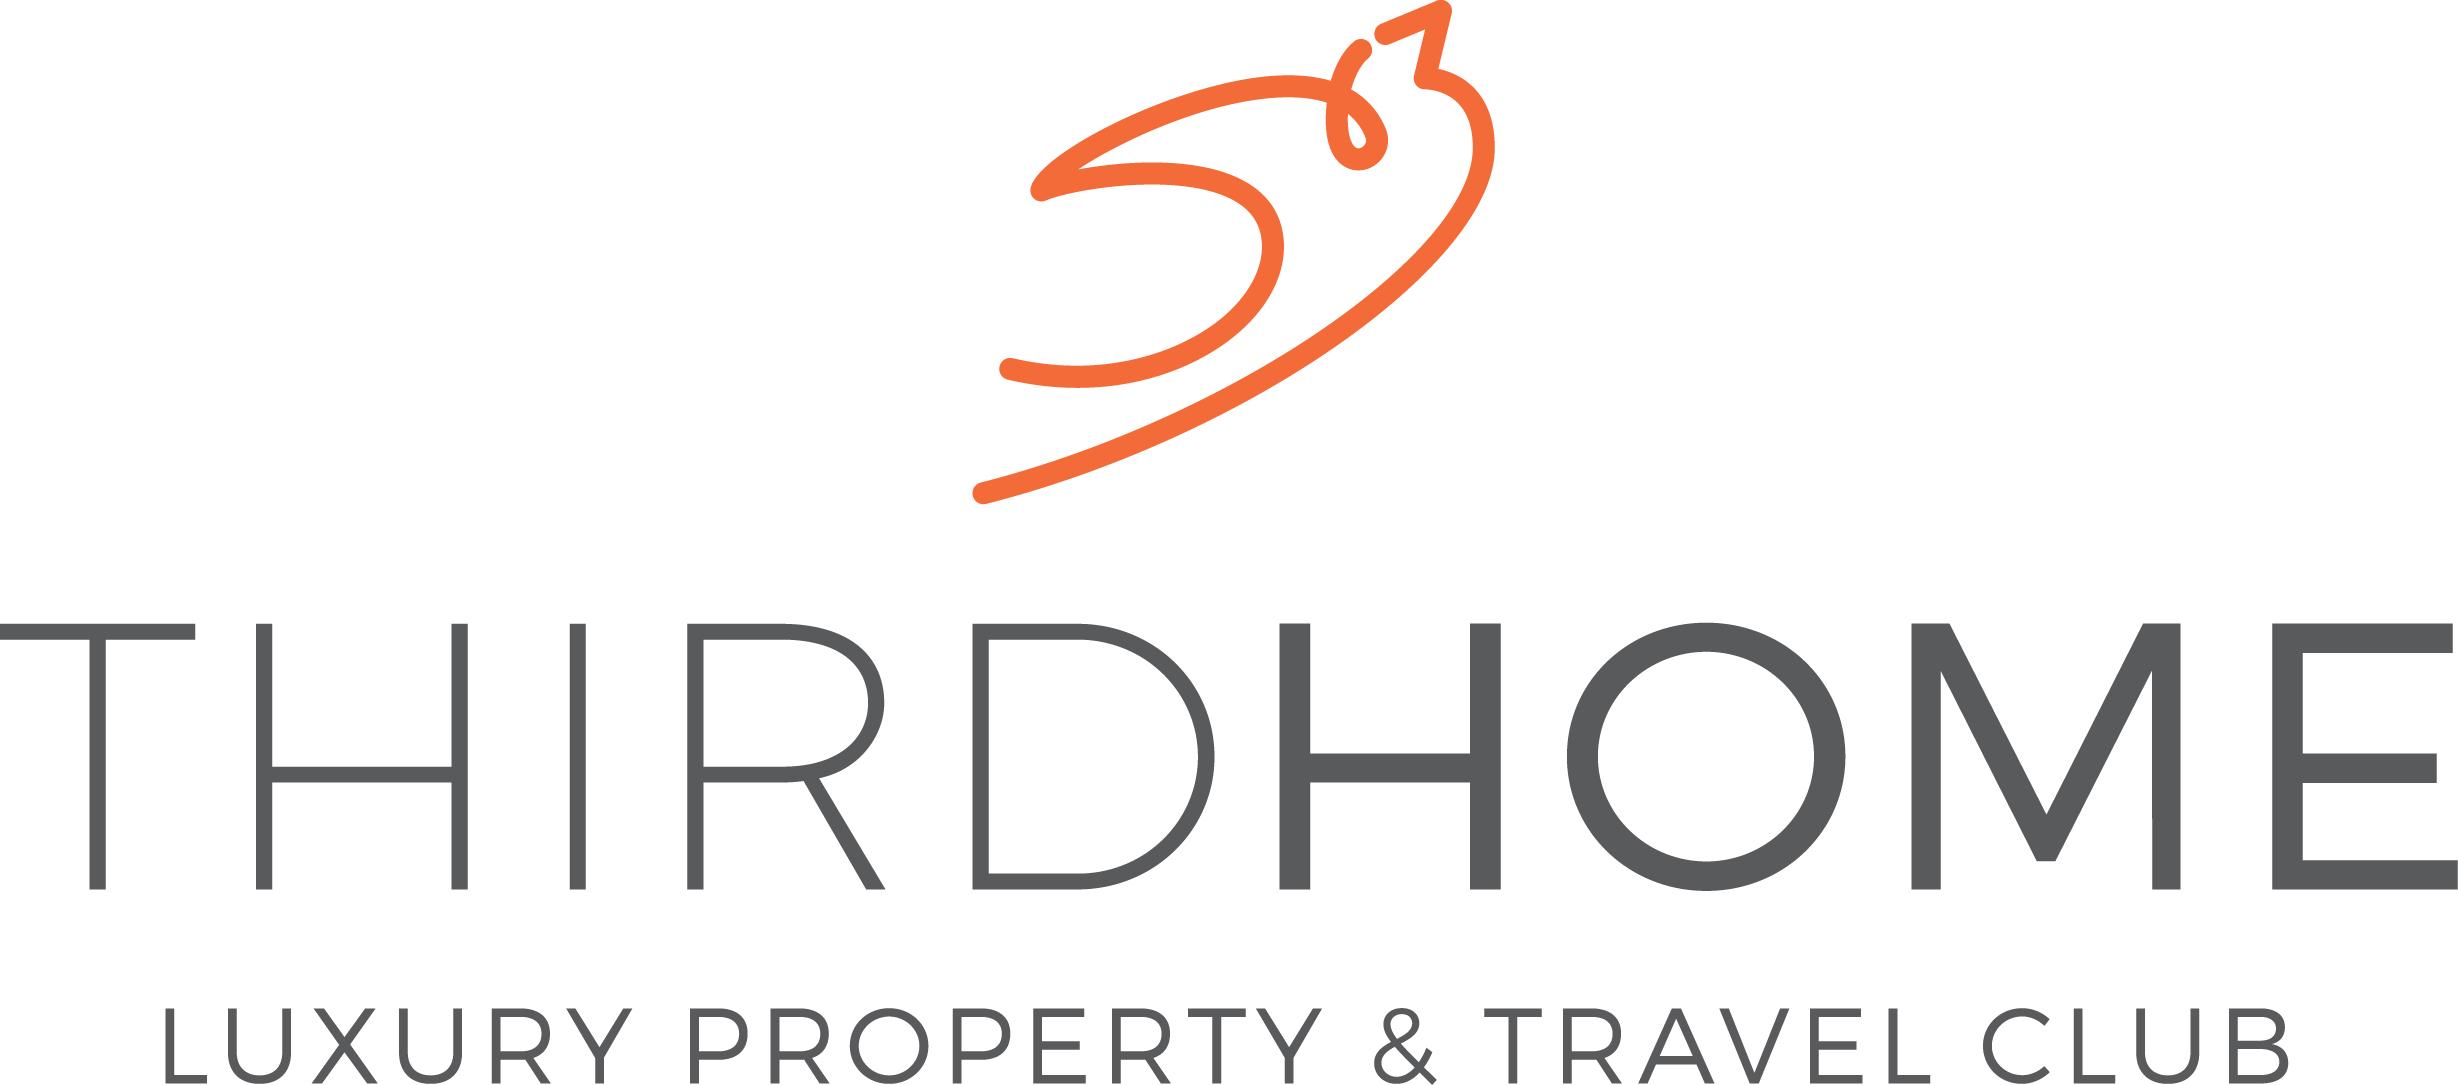 Thirdhome Grifco Pr Luxury Travel